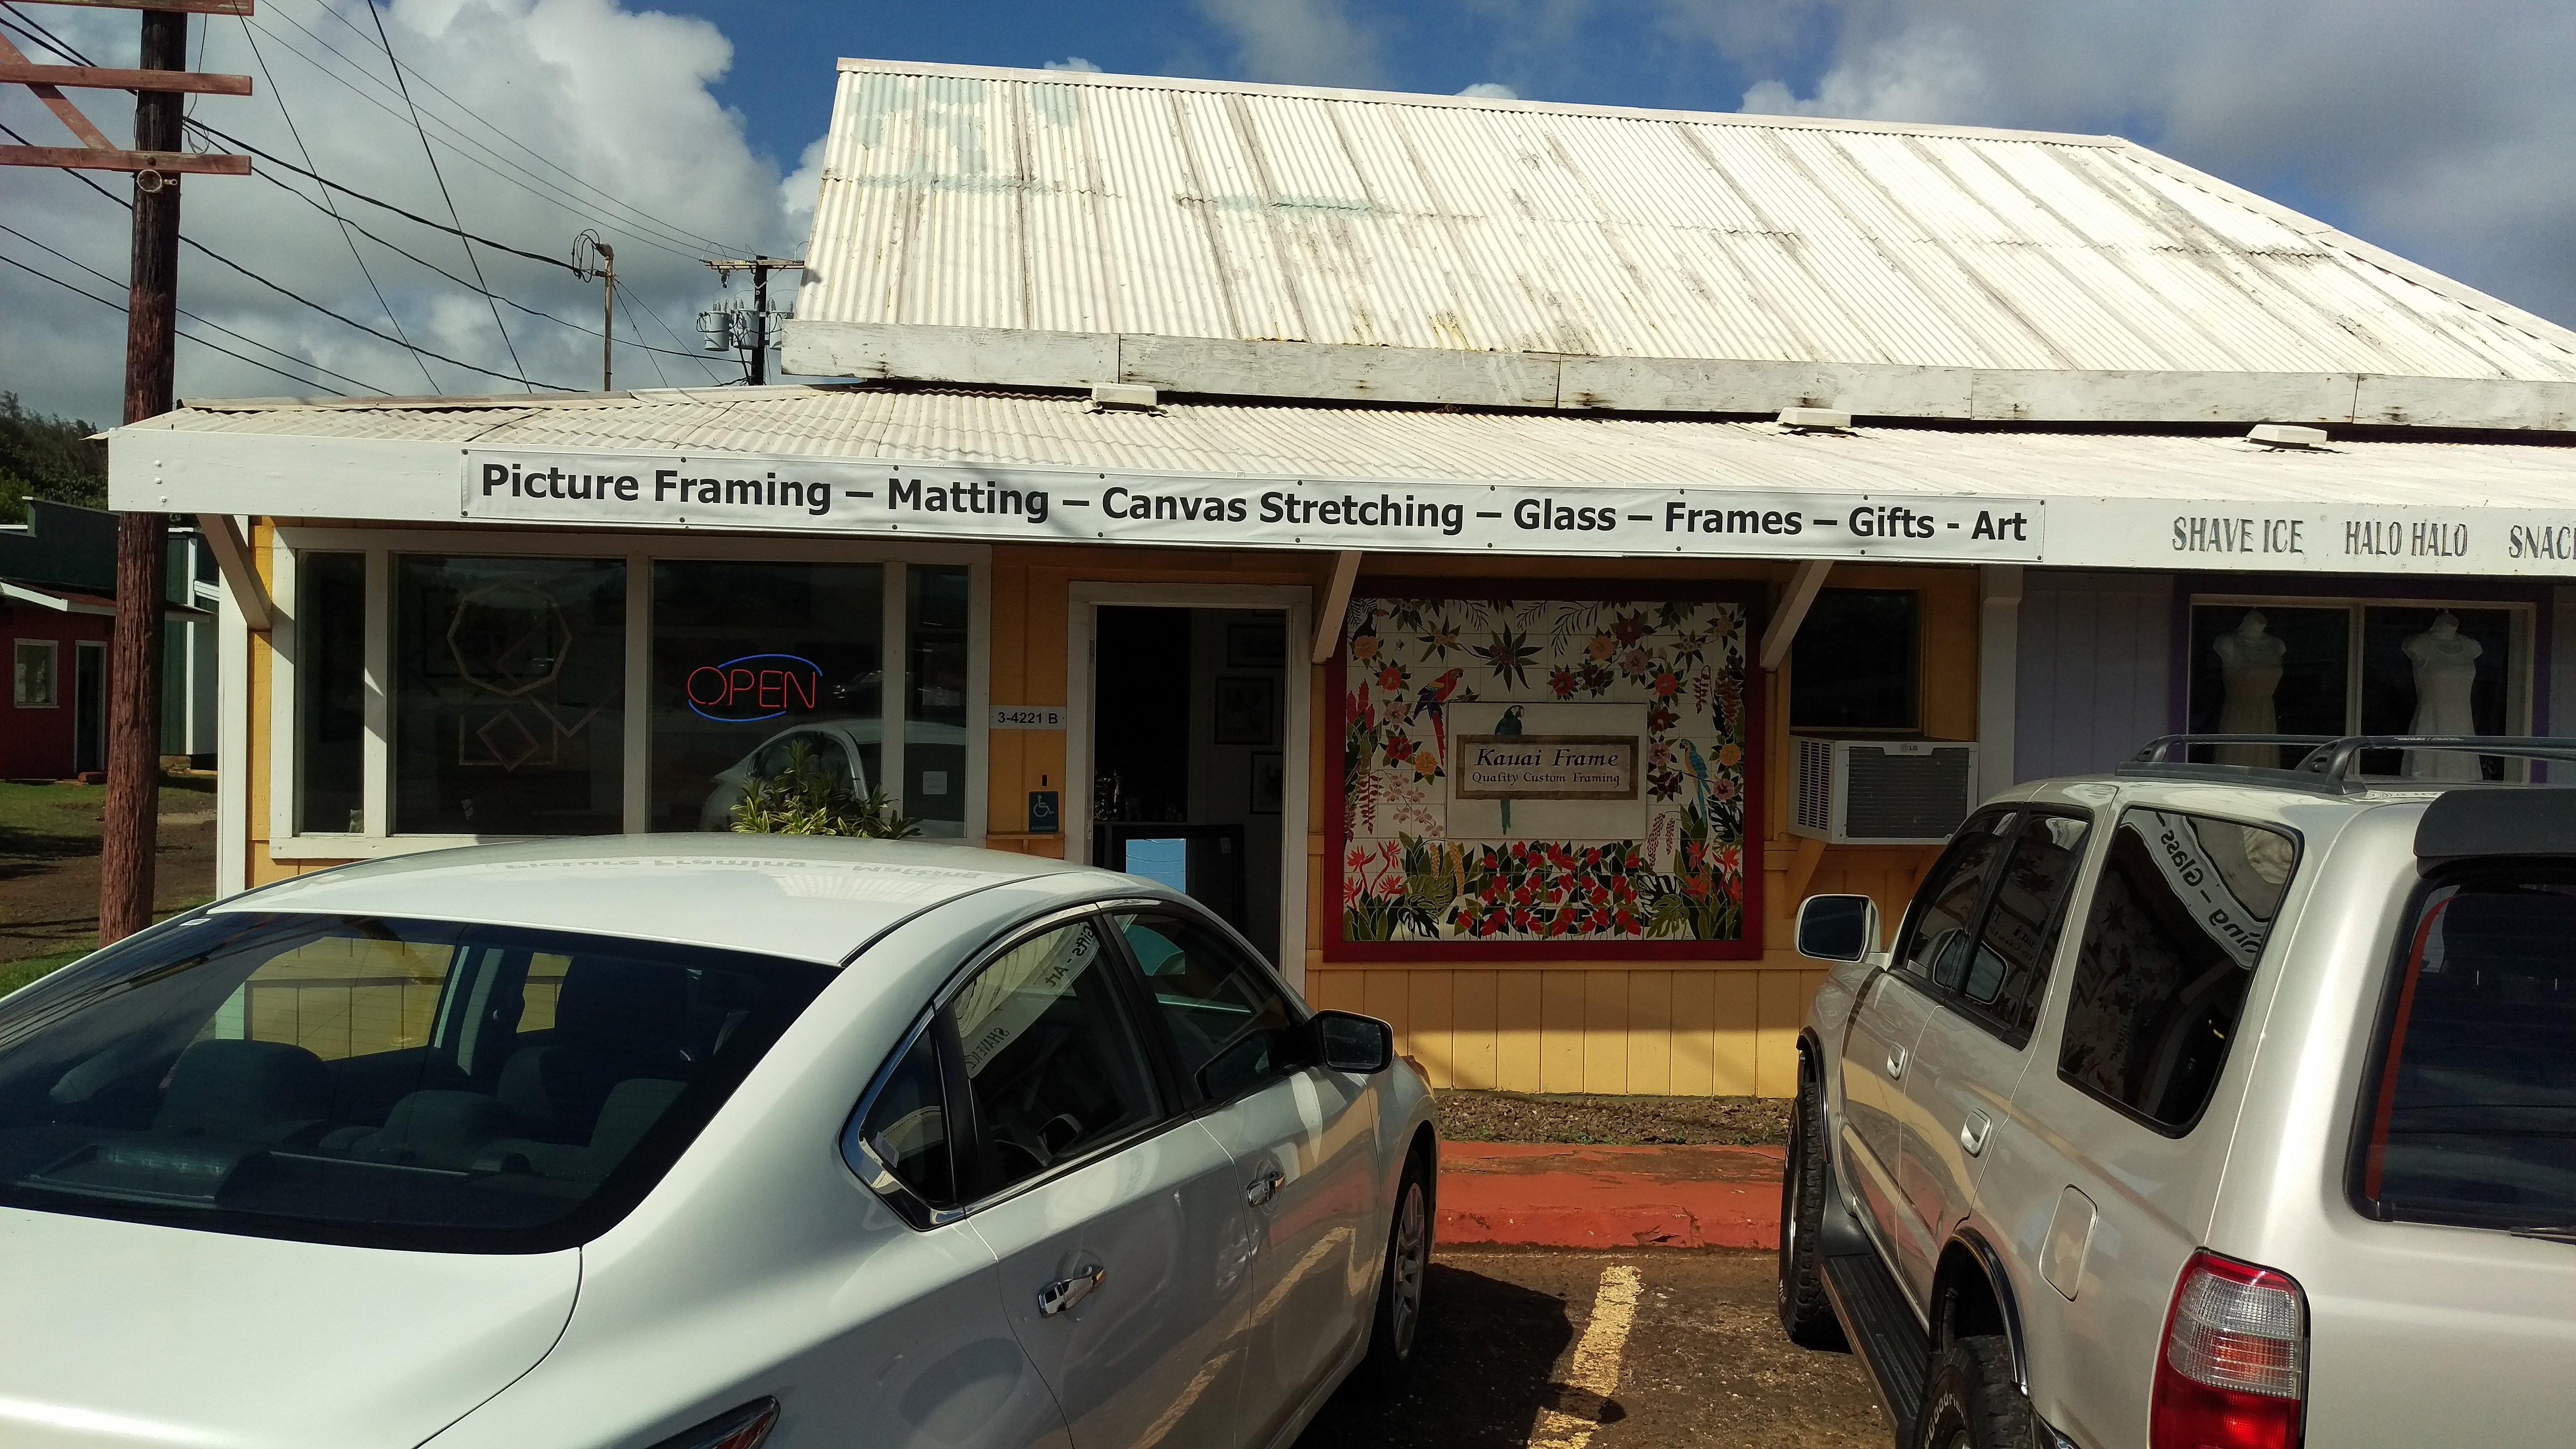 Kauai Frame Shop in Lihue